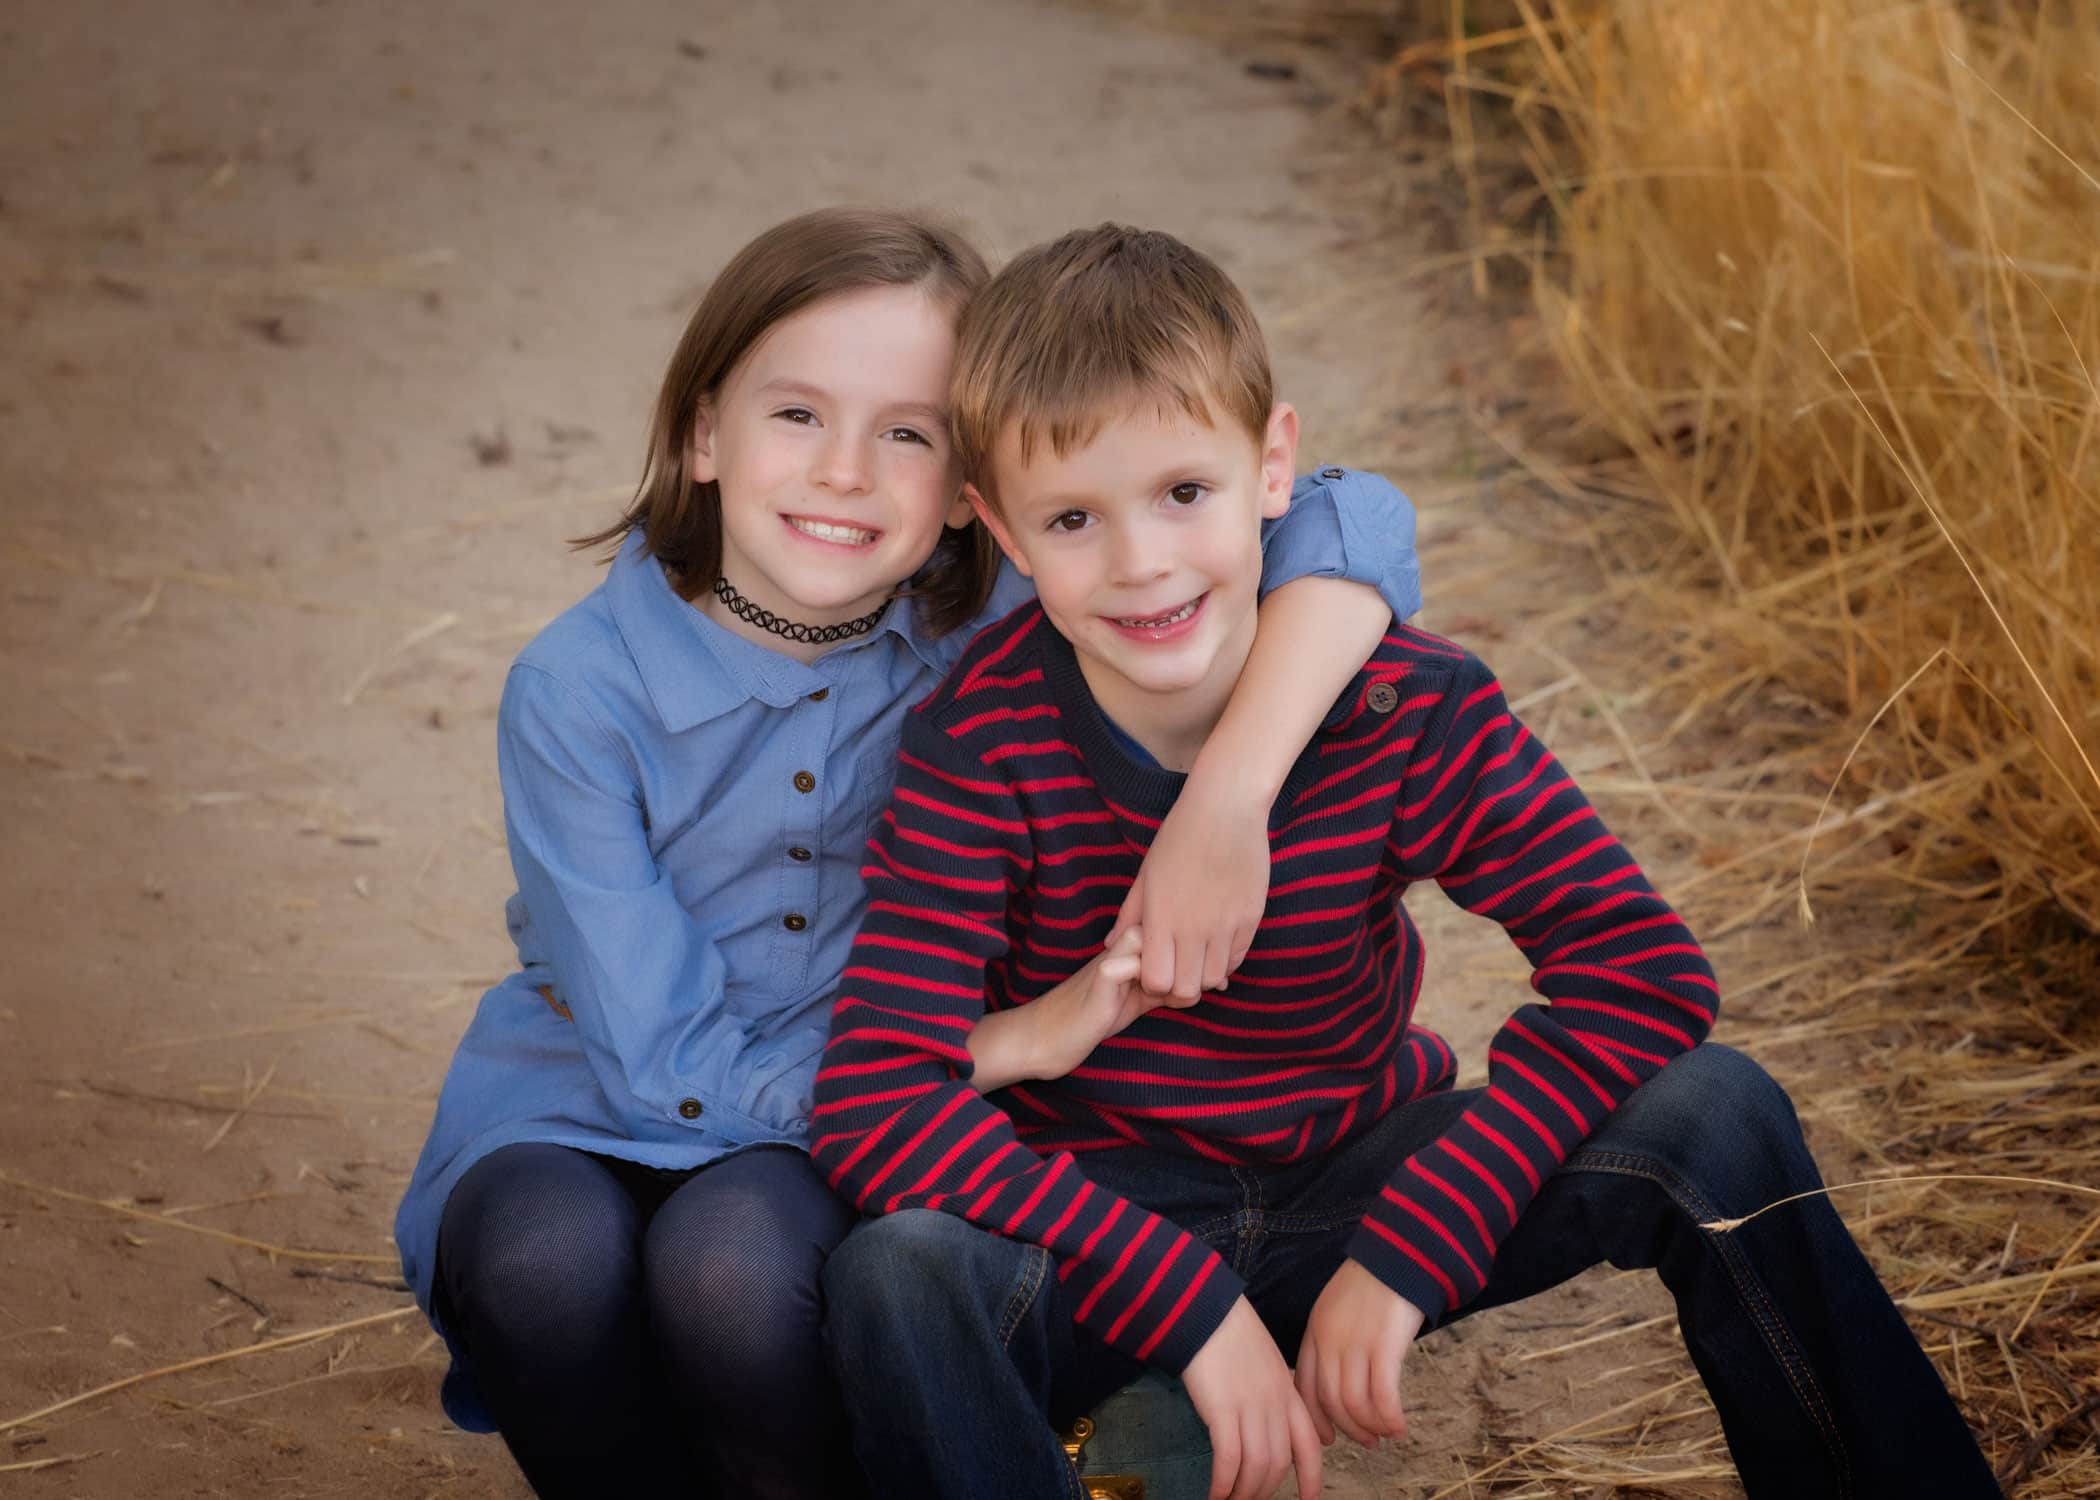 2 children sitting on a dirt road